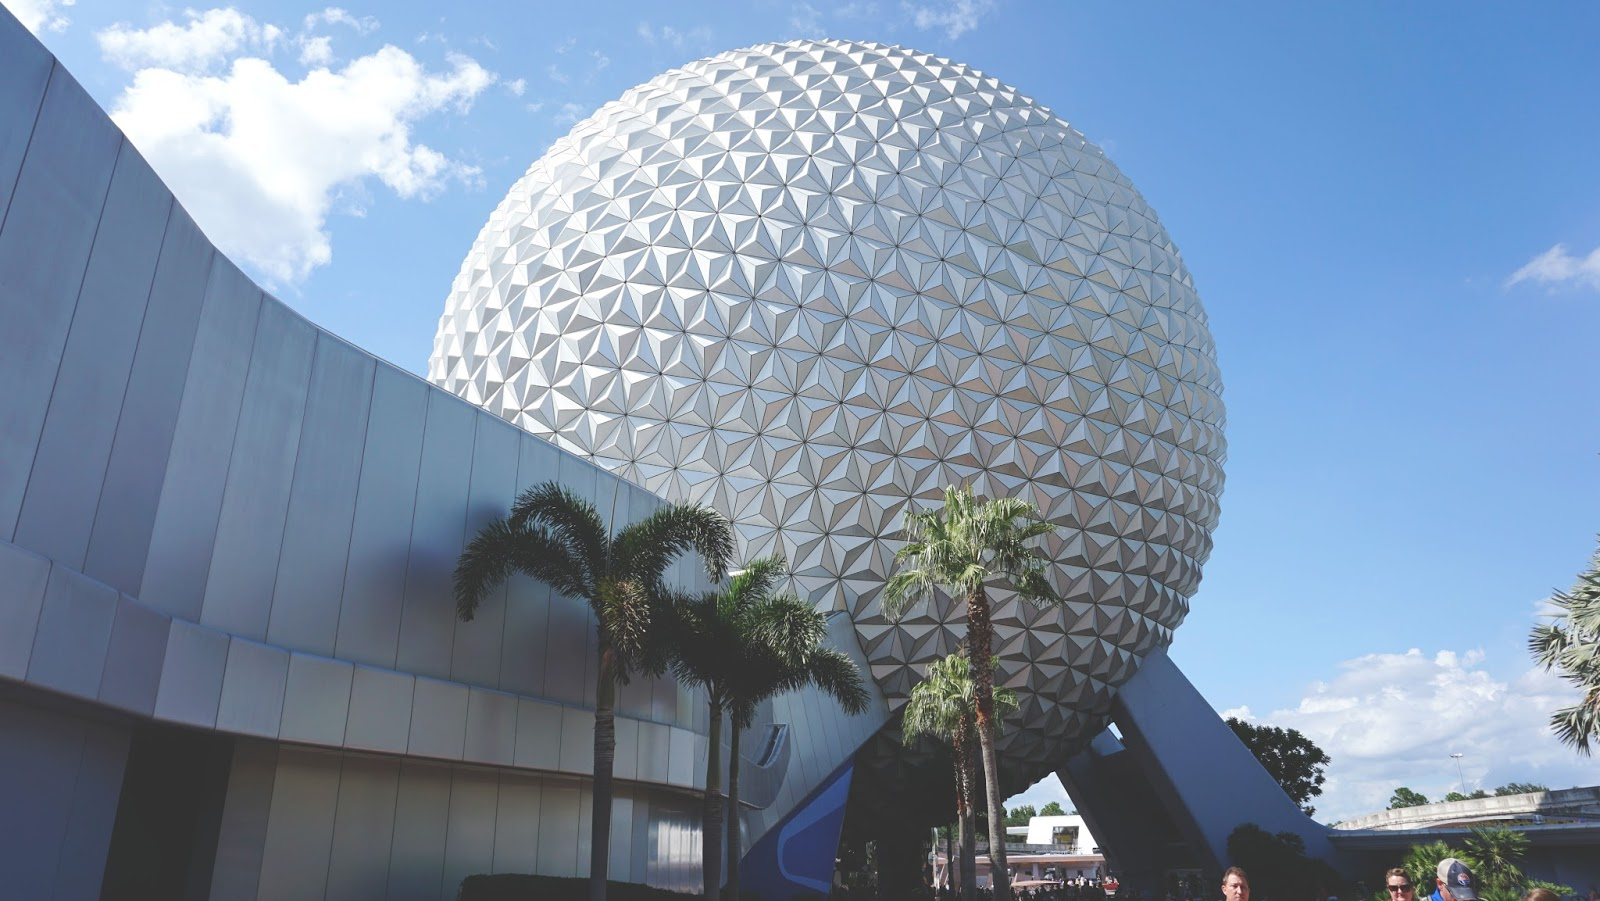 EPCOT in Disney World, Florida